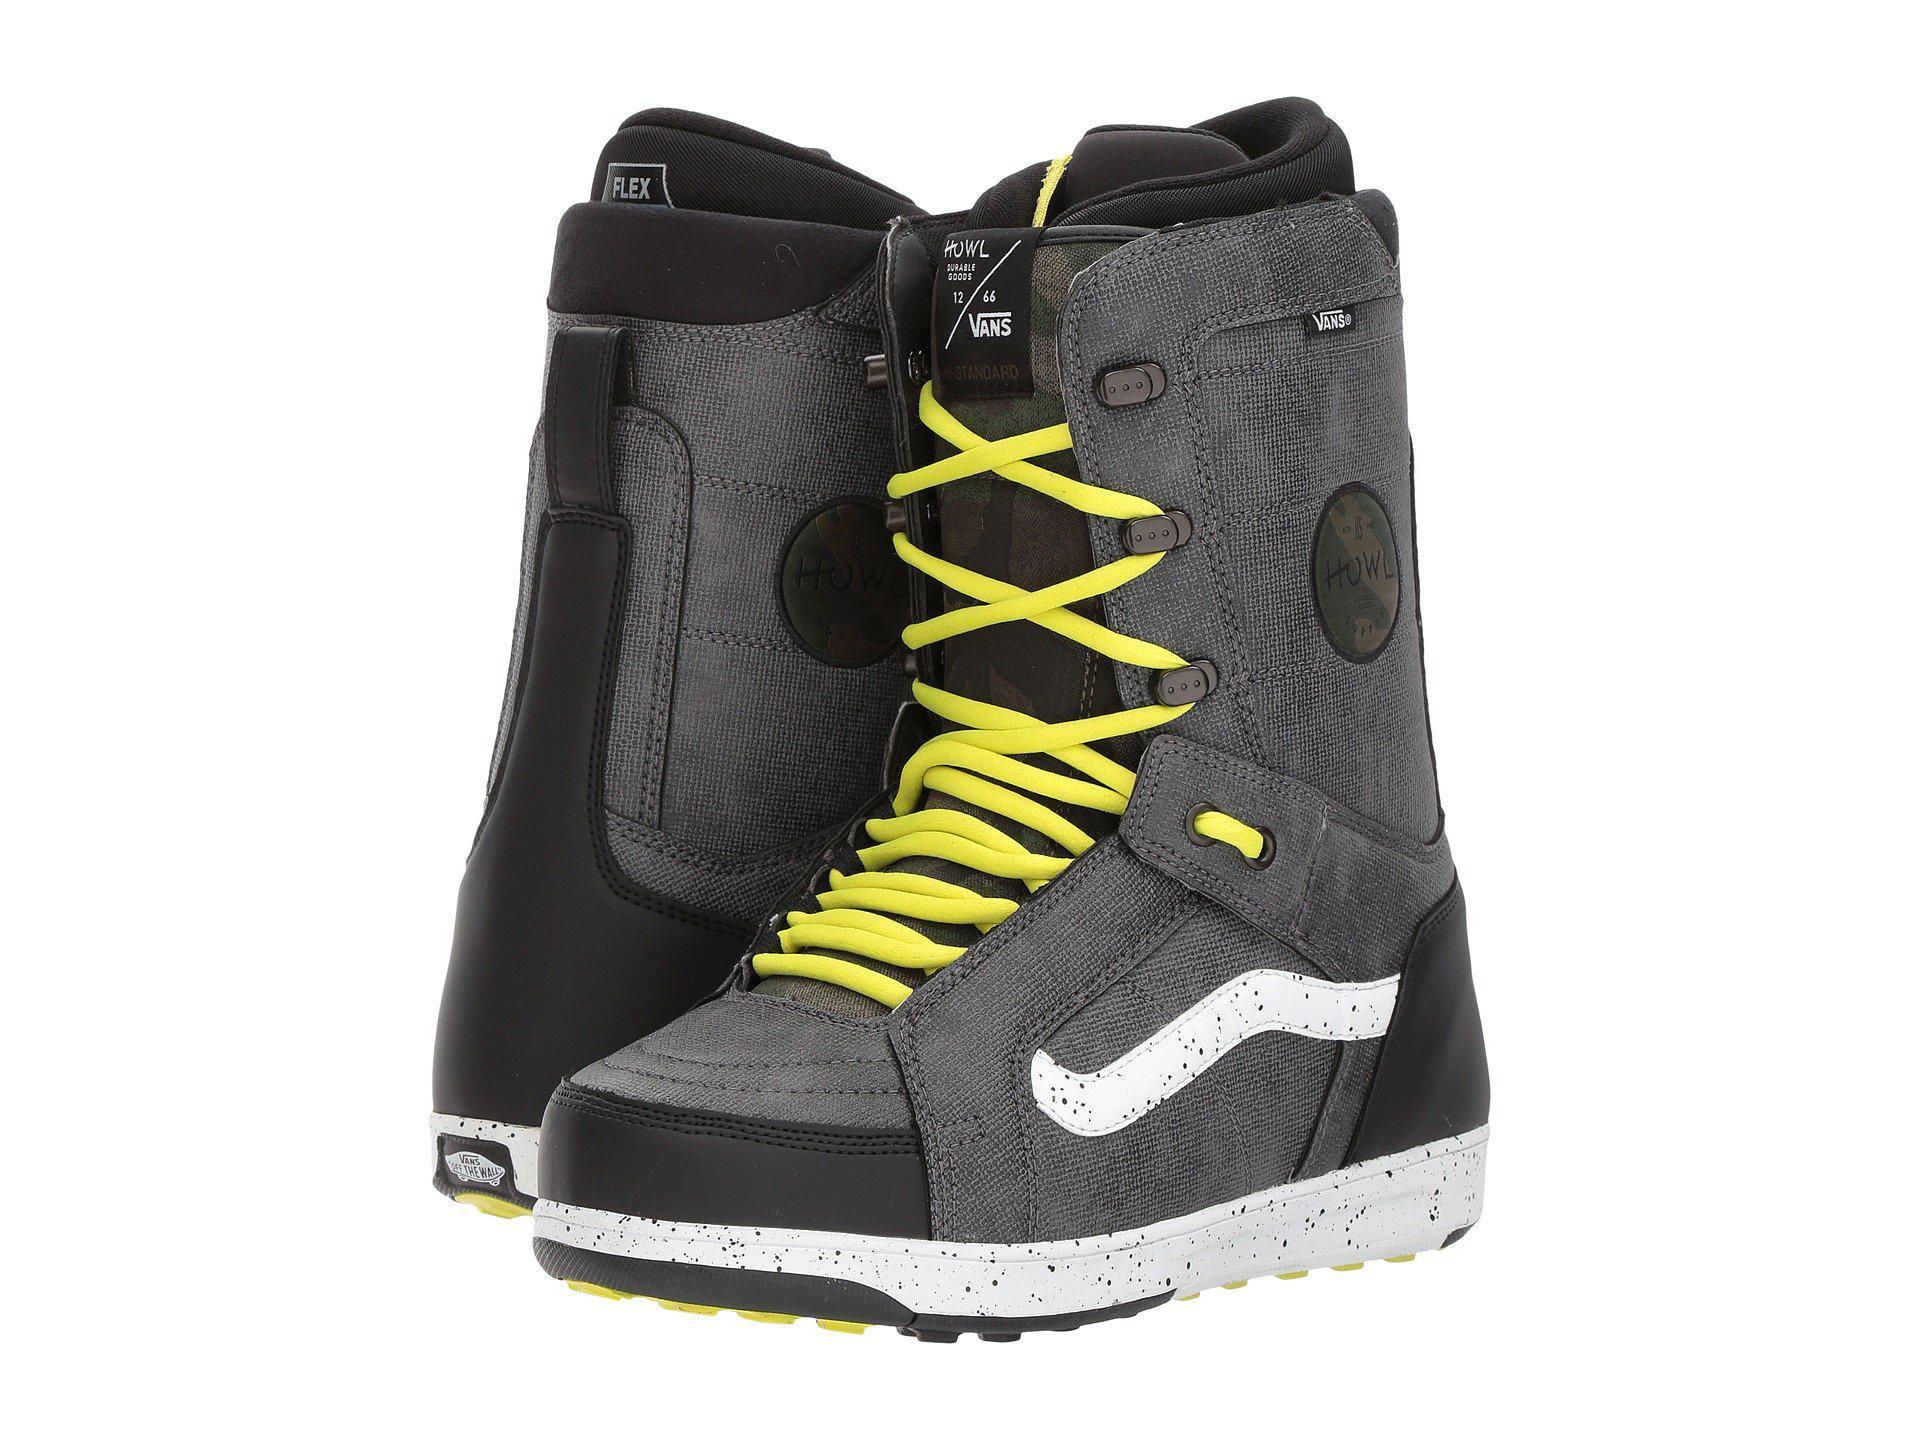 9dadf0d7d45b Lyst - Vans Hi-standard ((howl) Black sulphur) Men s Snow Shoes in ...